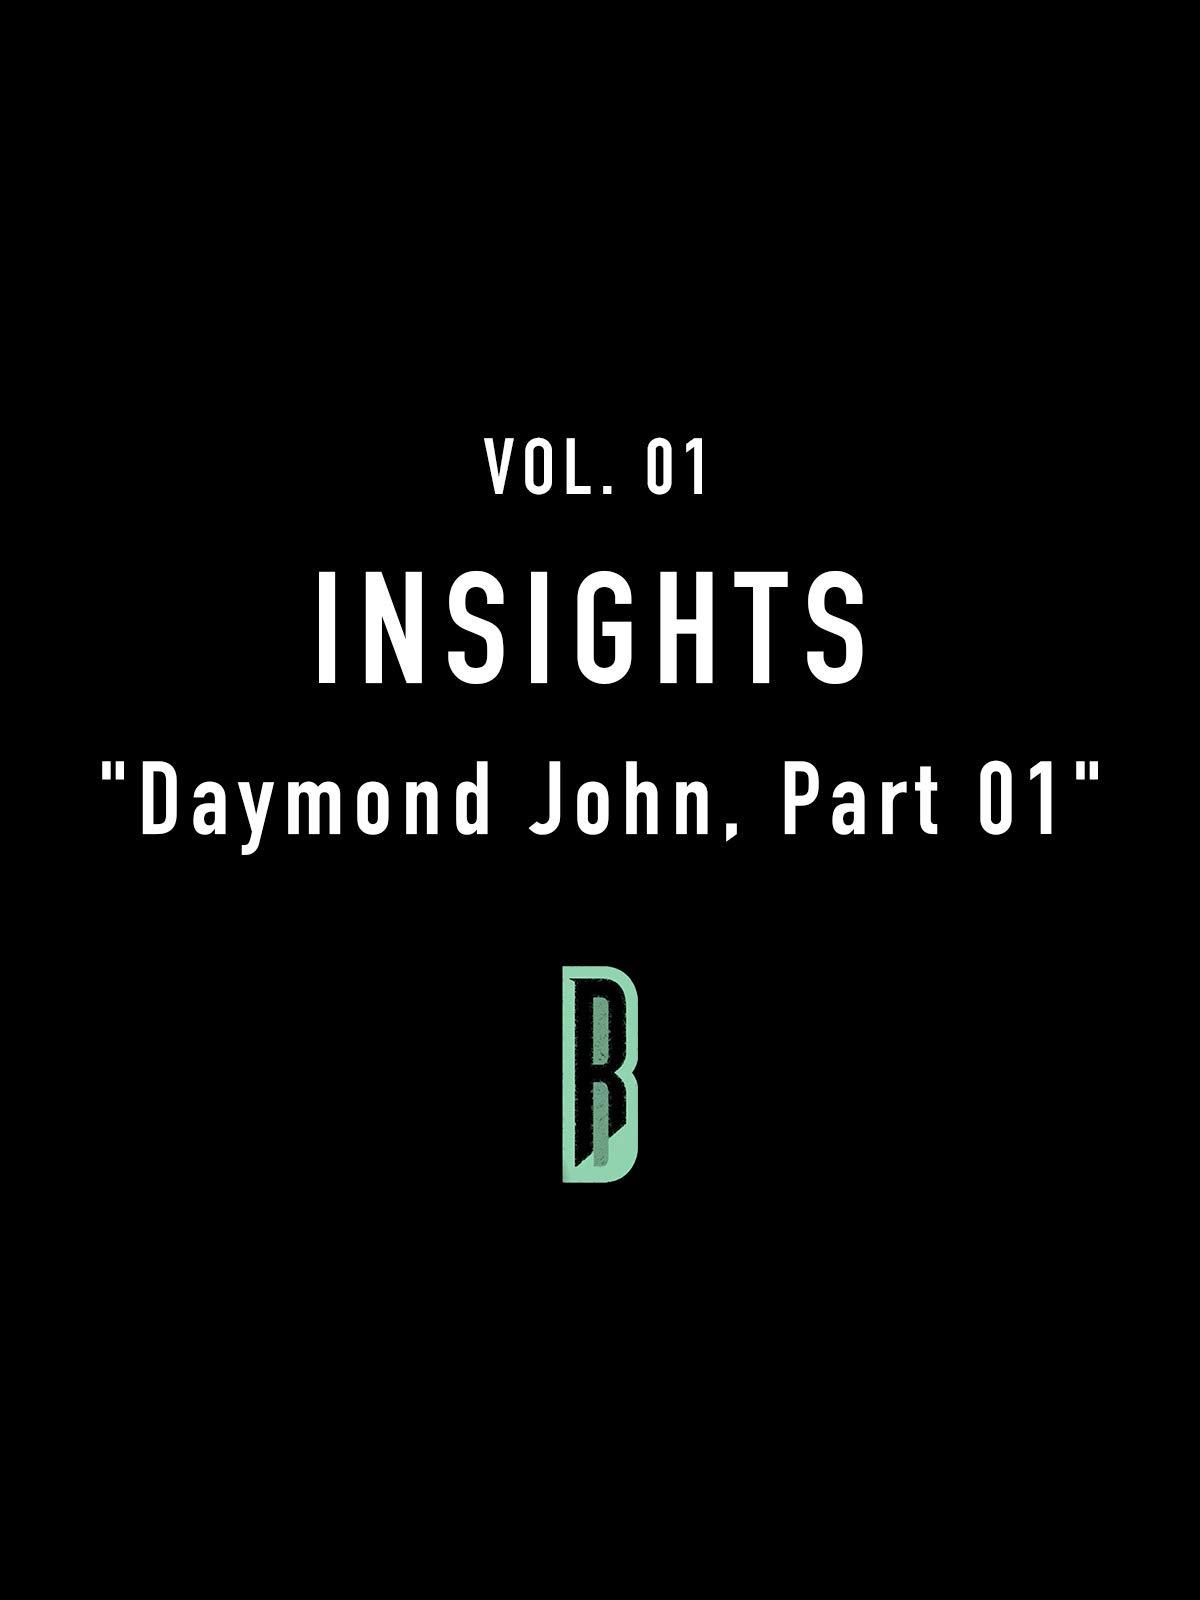 Insights Vol. 01